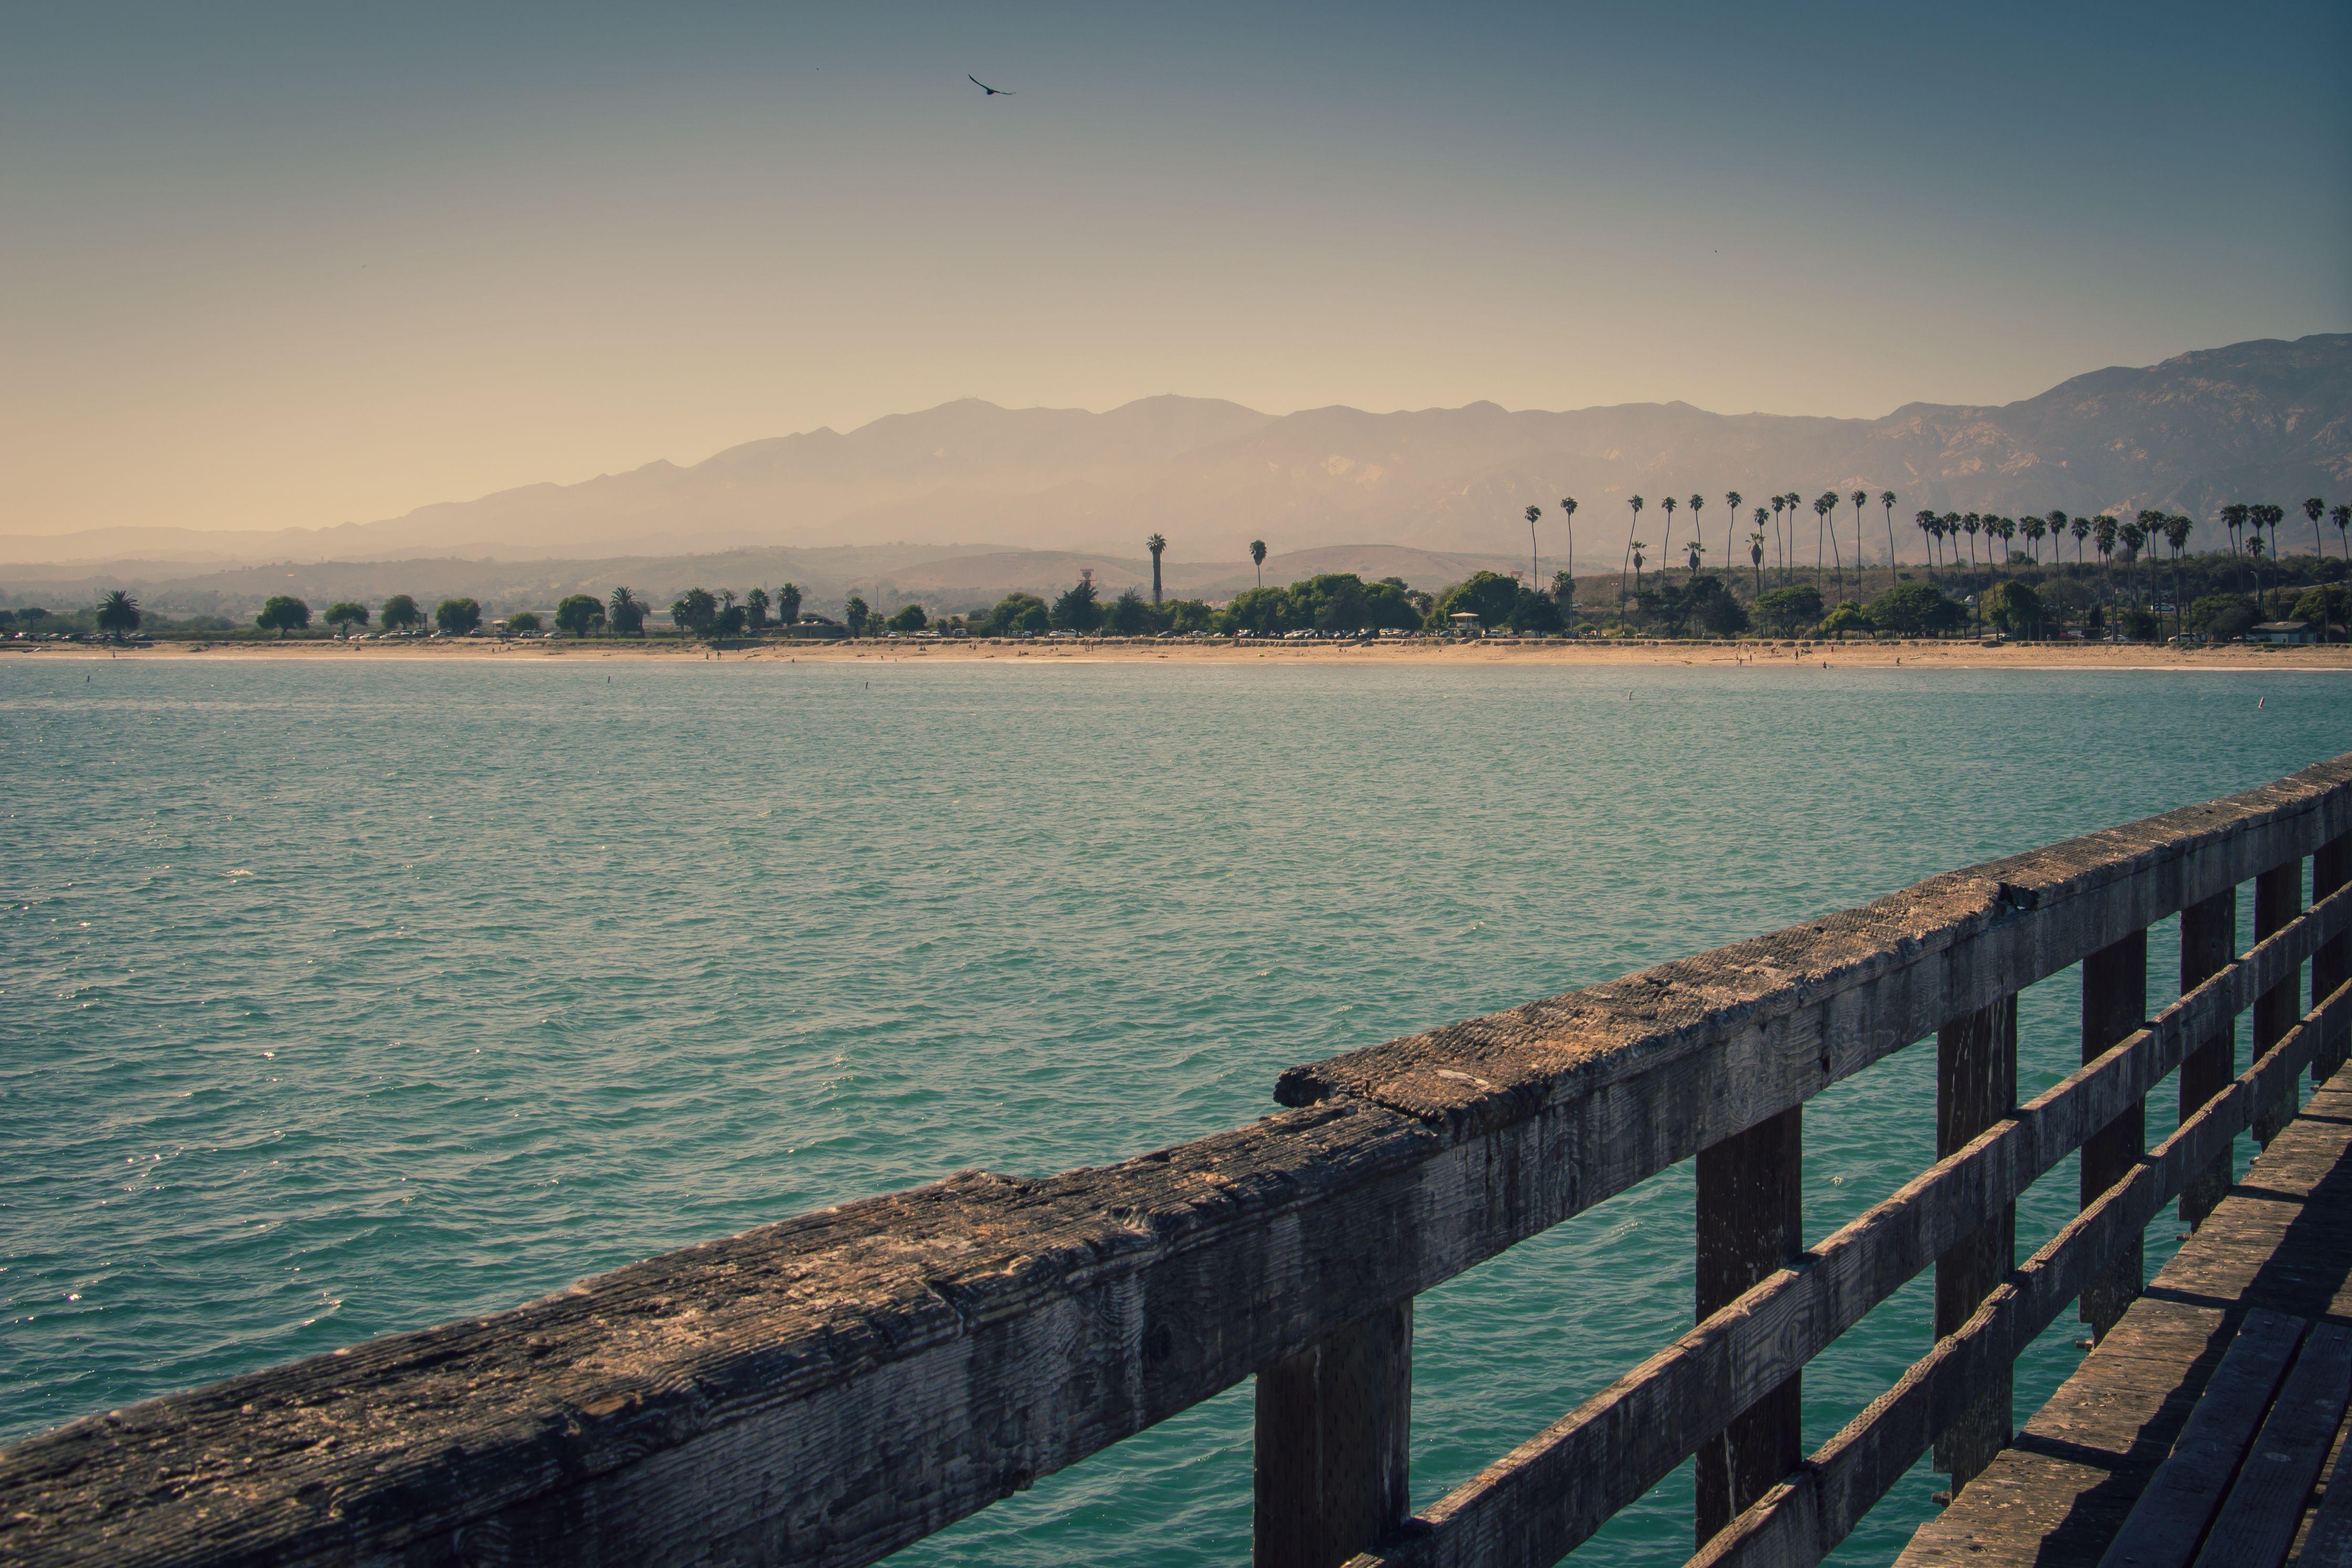 Ocean view from the pier in Goleta, CA (Santa Barbara County)   California wallpapers via Imwaytoobusy.com